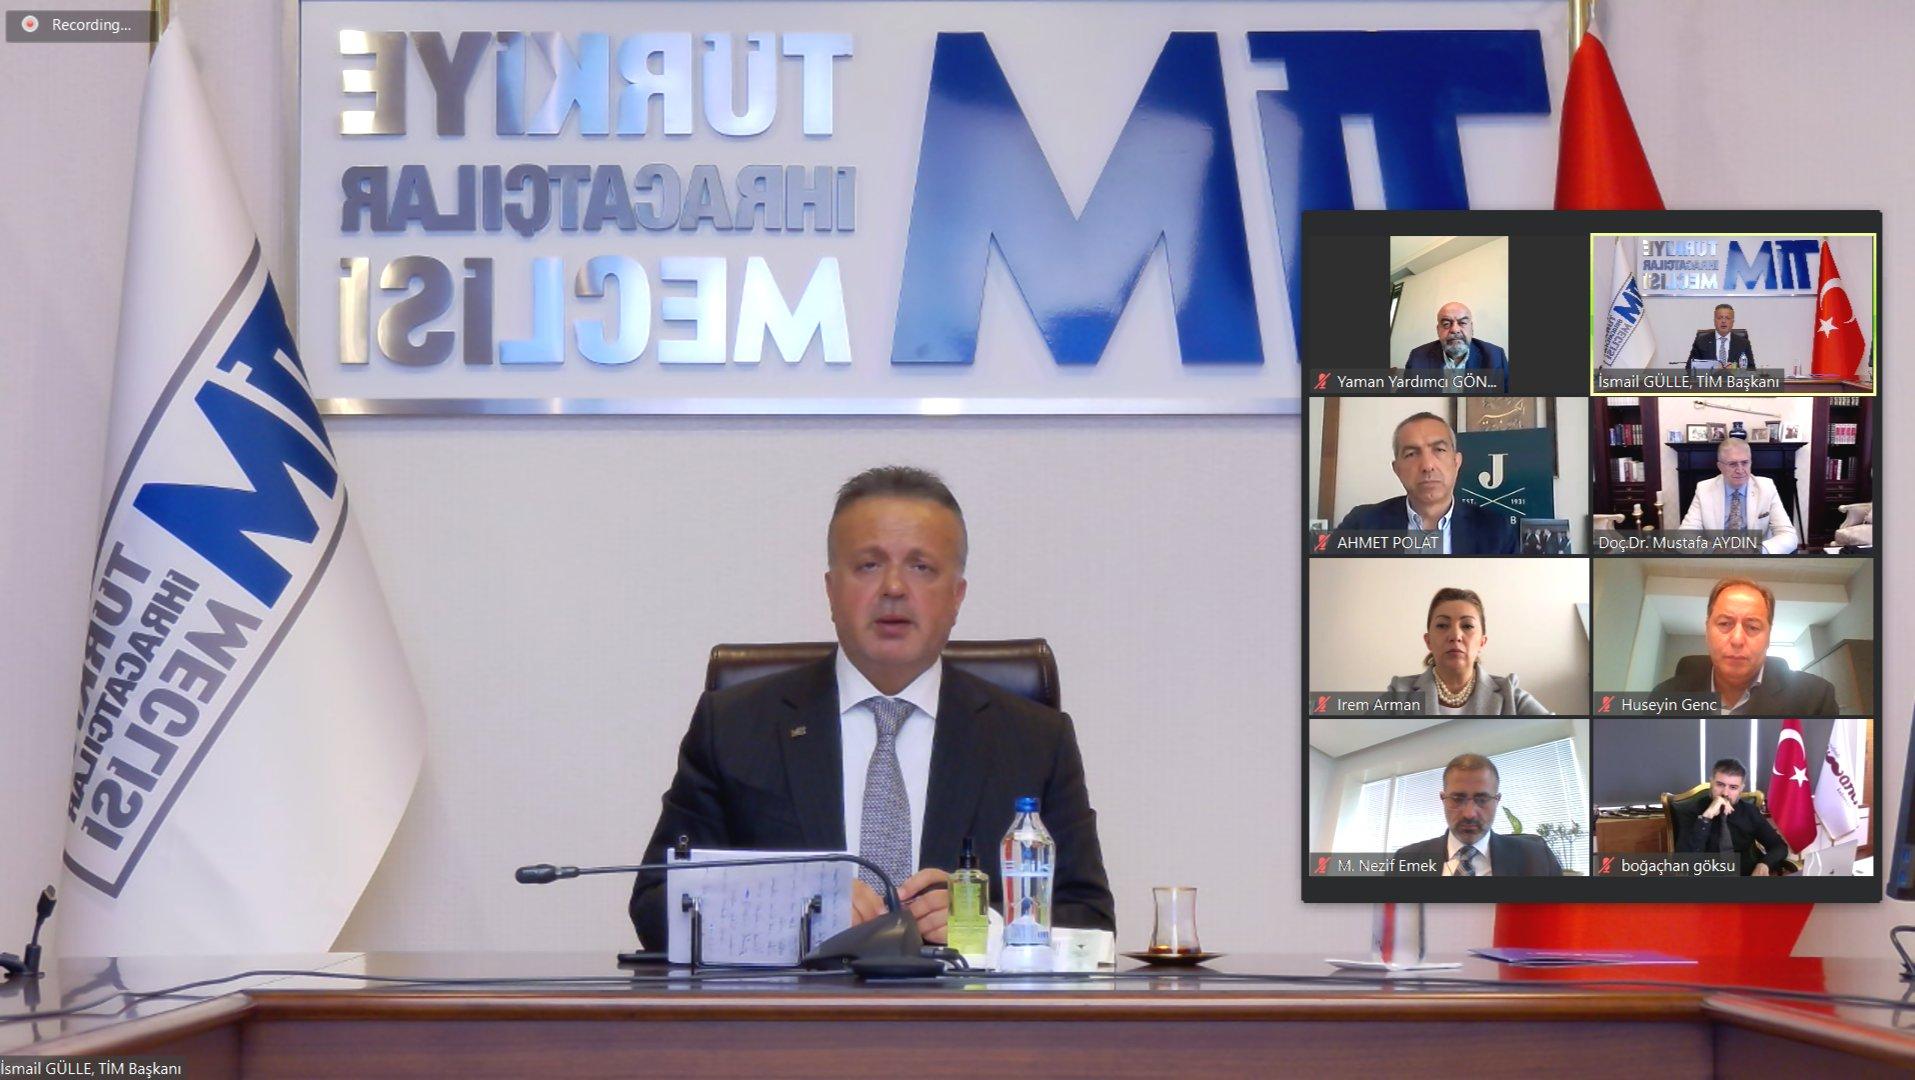 http://mustafaaydin.com/wp-content/uploads/2020/07/İSMAİL-GÜLLE.jpg